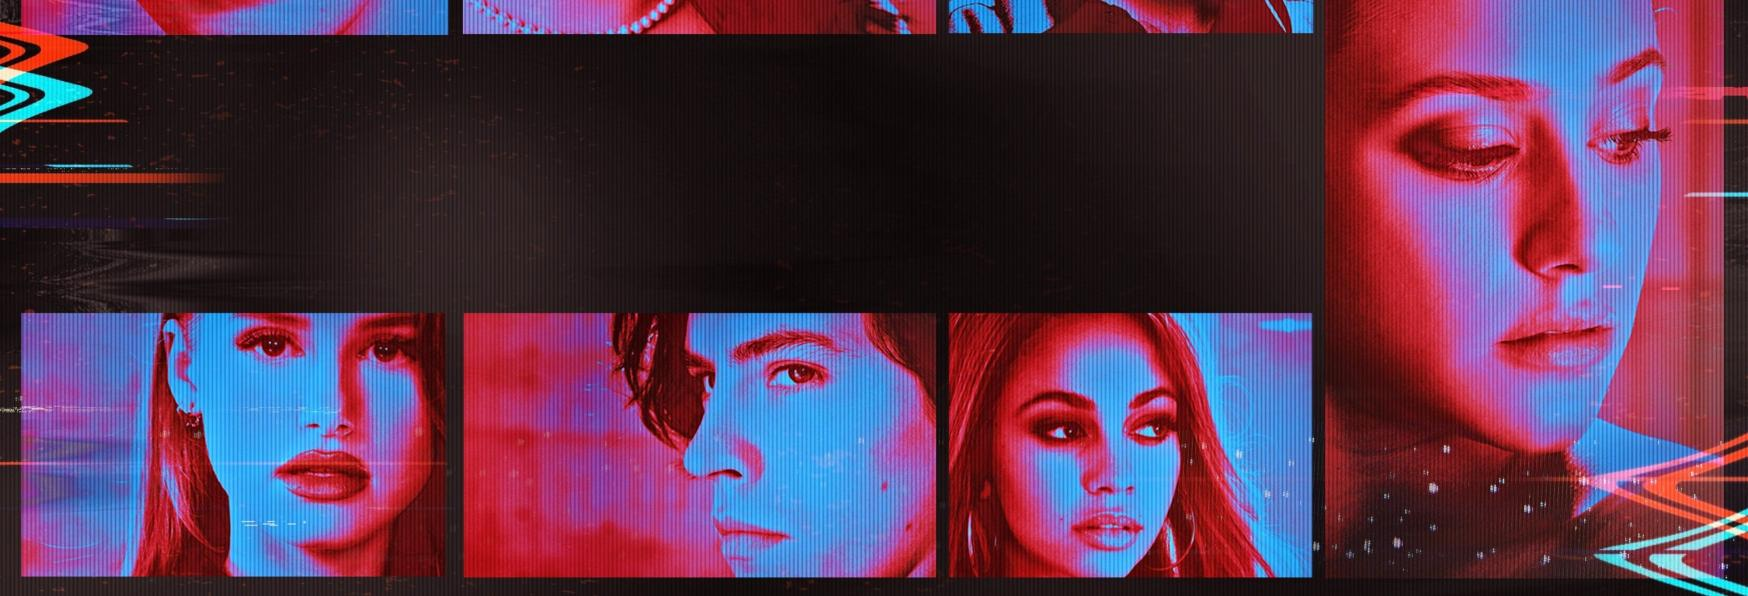 "Riverdale: la Recensione dell'Episodio 4x10, ""Chapter Sixty-Seven: Varsity Blues"""